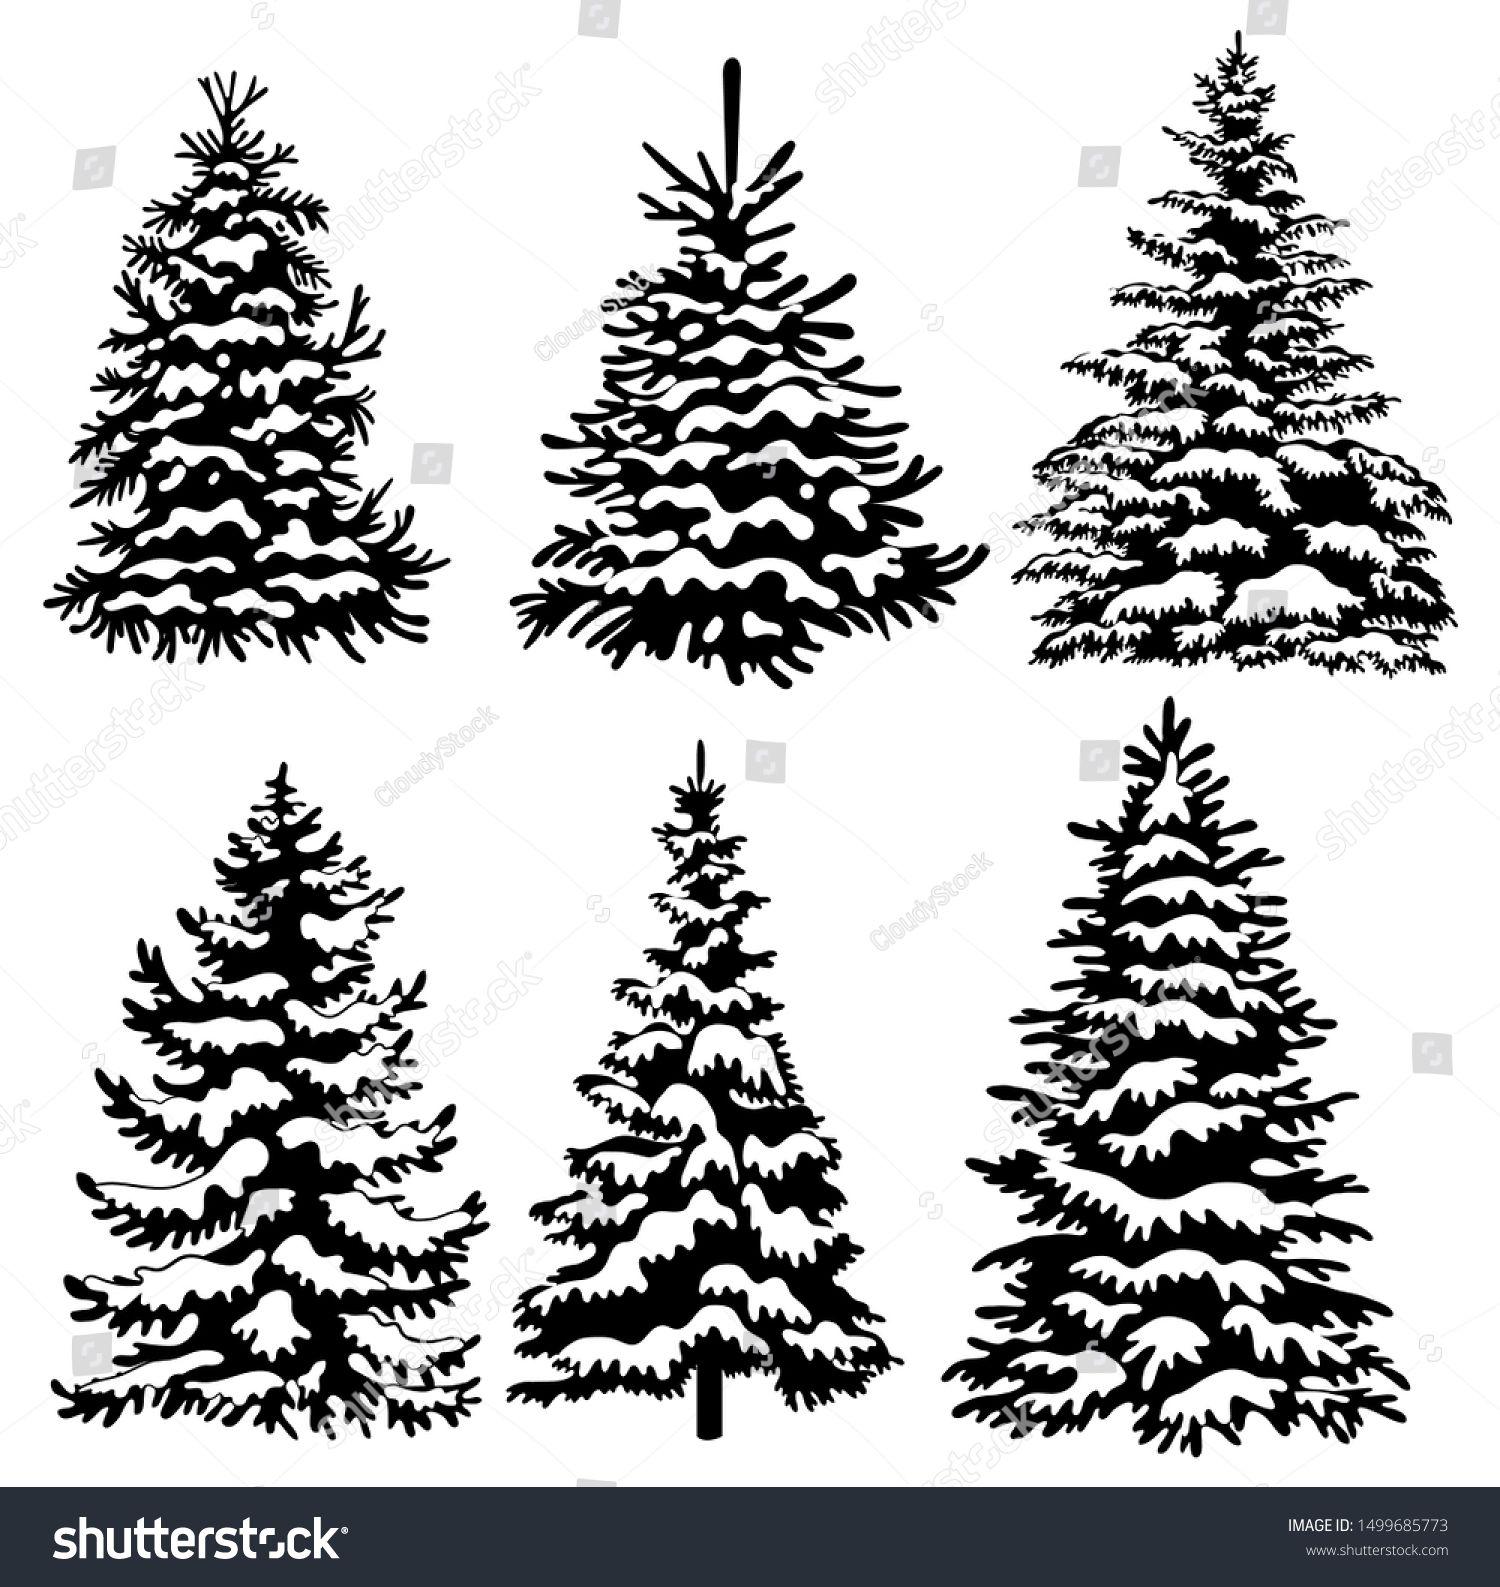 Free Printable Black And White Christmas Trees Description From Pinterest Com I Searche Christmas Tree Drawing Christmas Tree Clipart Whimsical Christmas Art